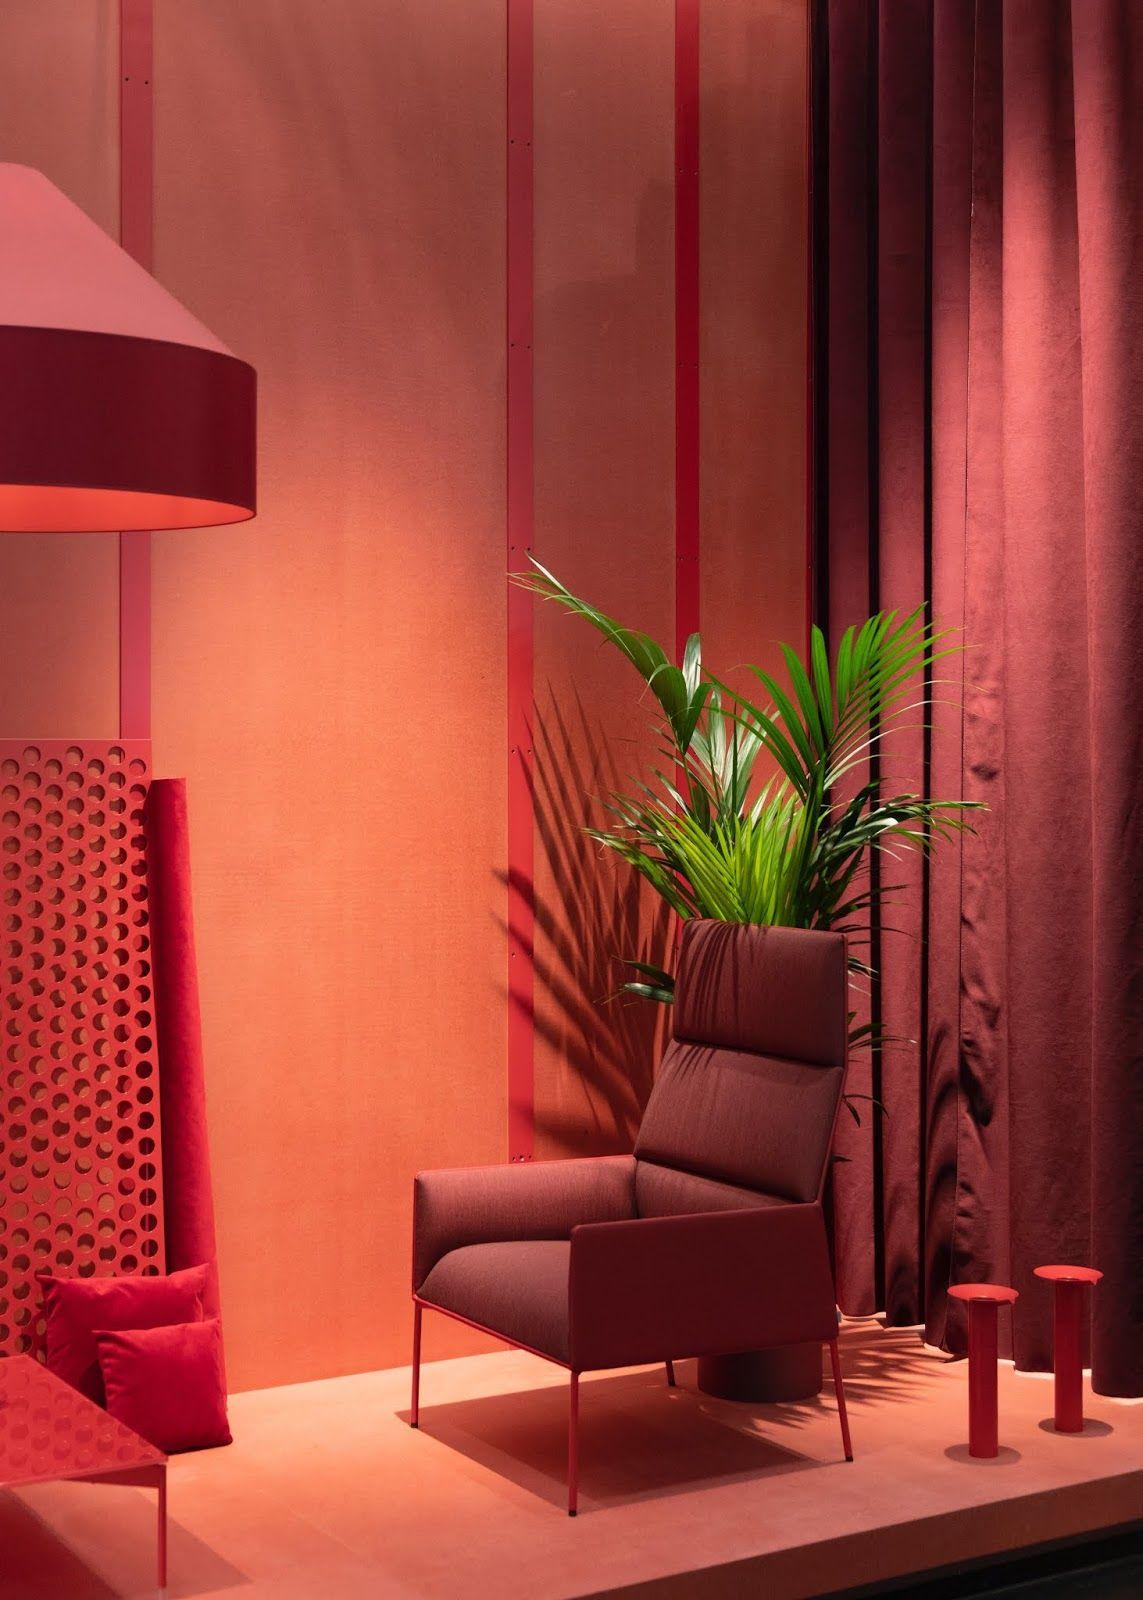 Interior minimalist home decor inspo by Unsplash   Minimalist home ...